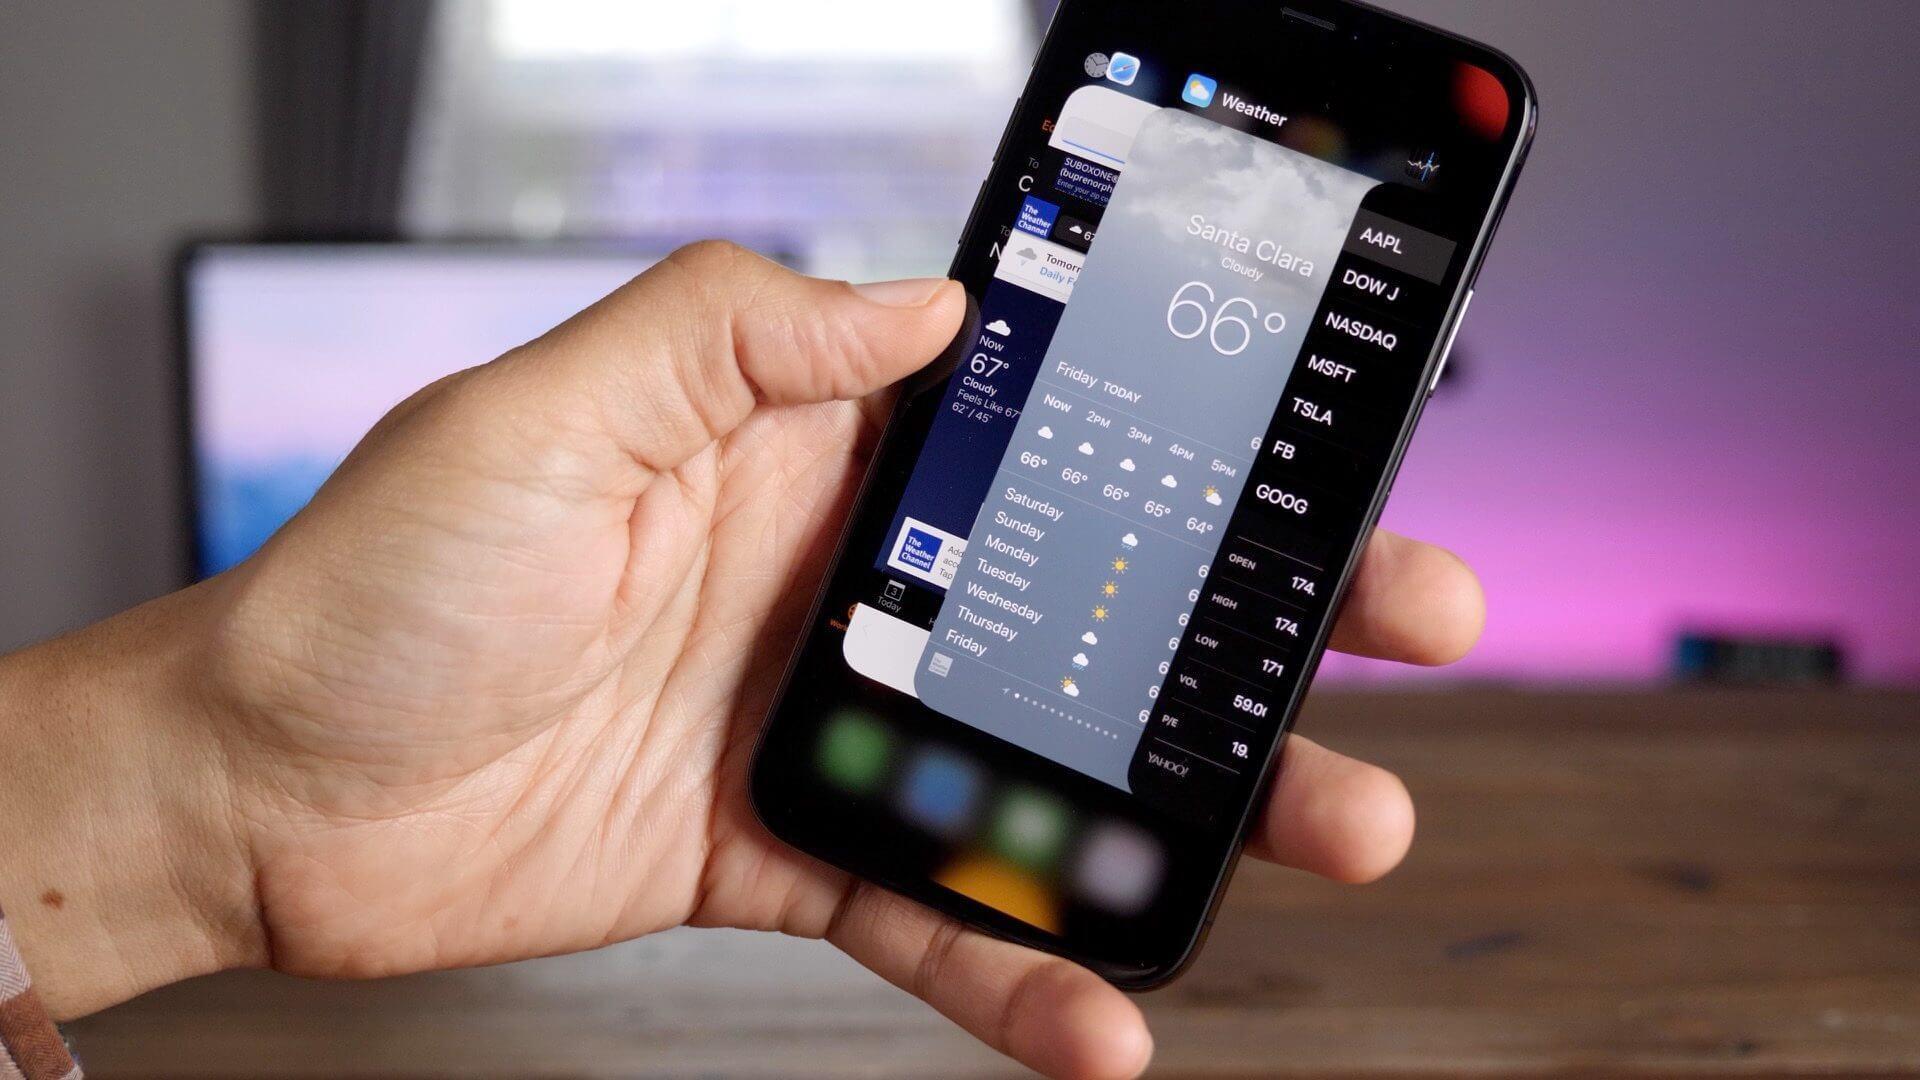 «Роскачество» опубликовало вердикт по iPhone X